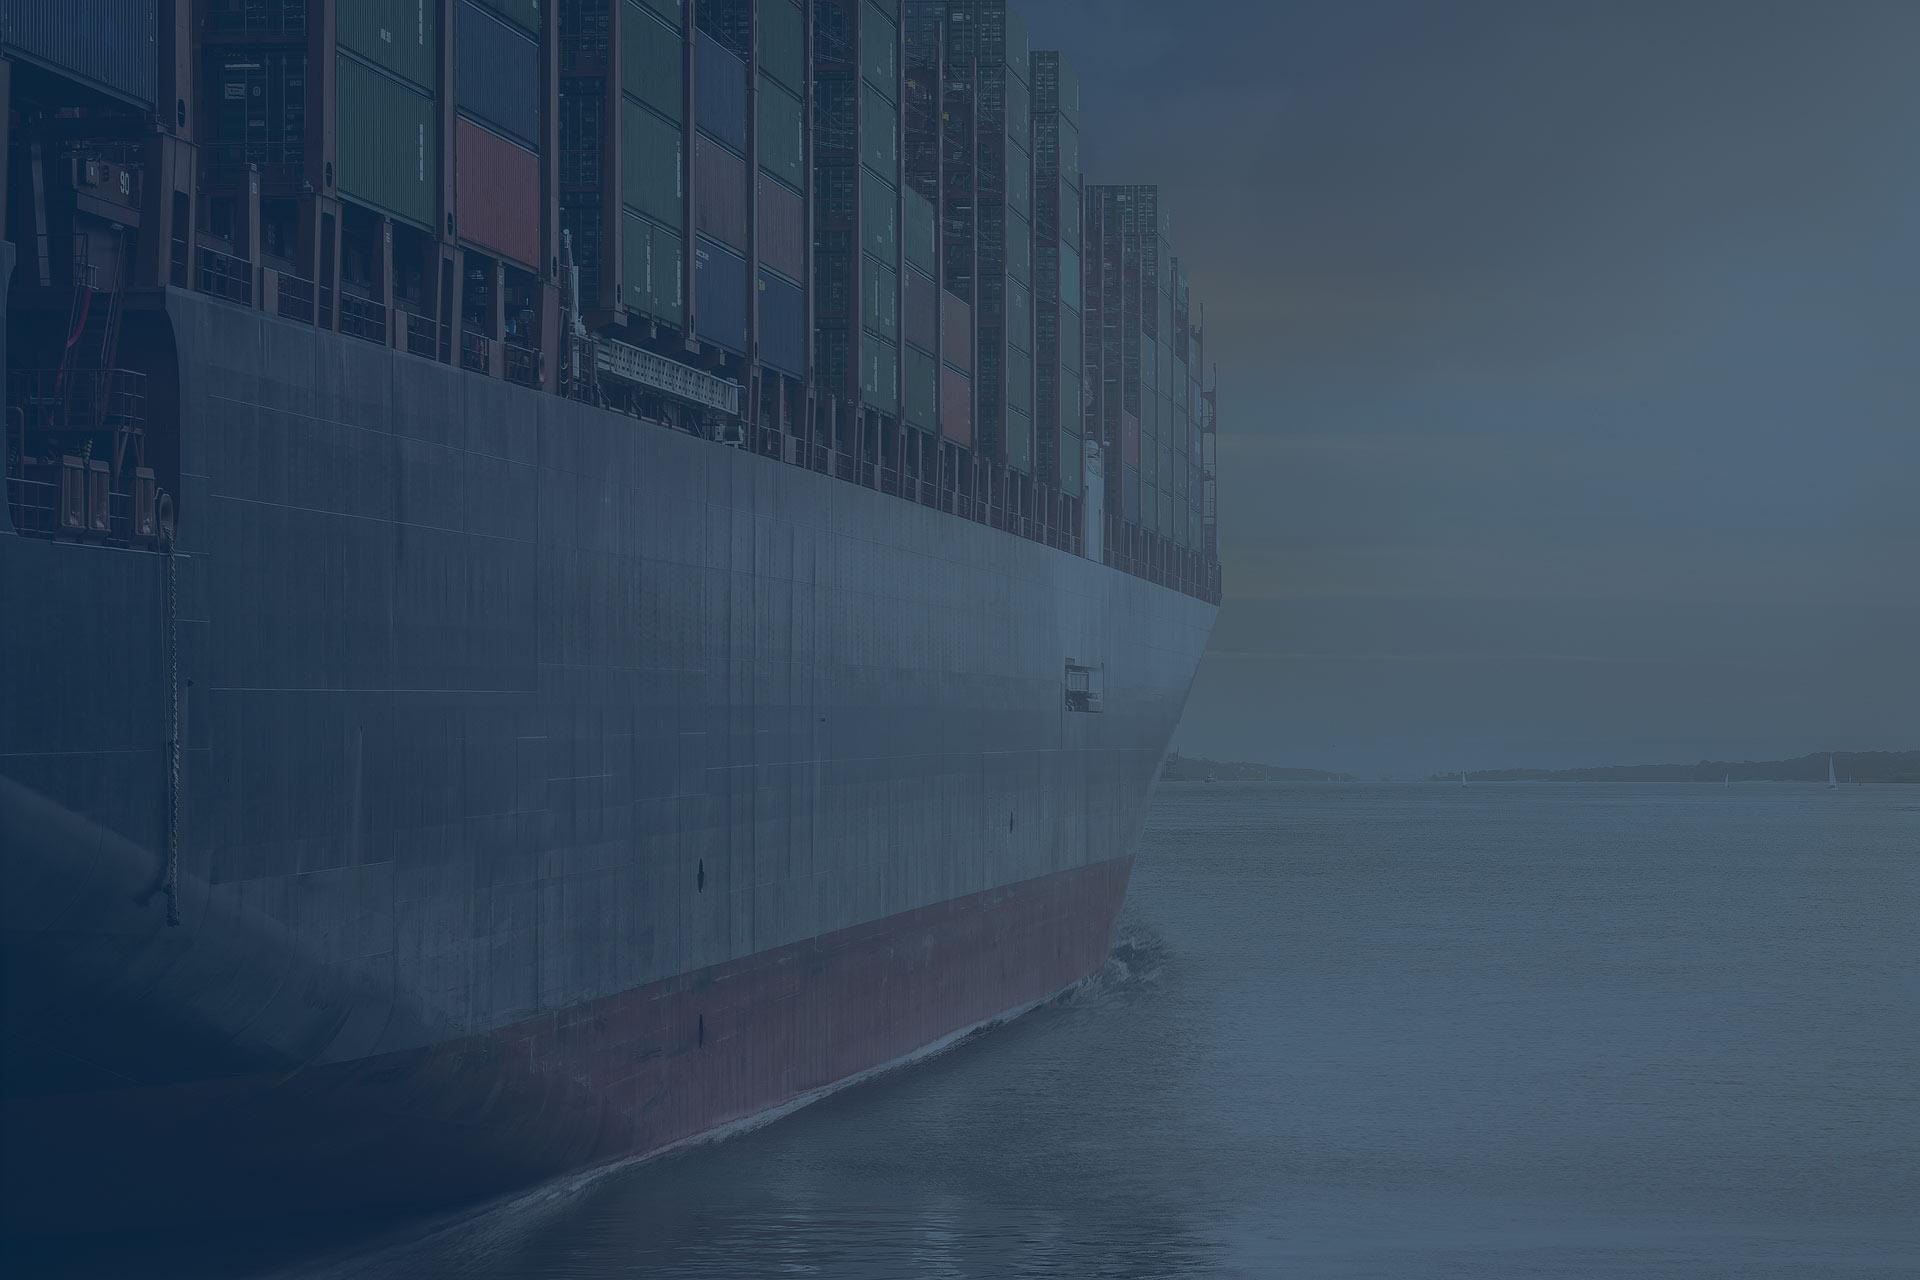 jetfreight-freight-forwarders-malta-customs-sea-shipping-to-malta